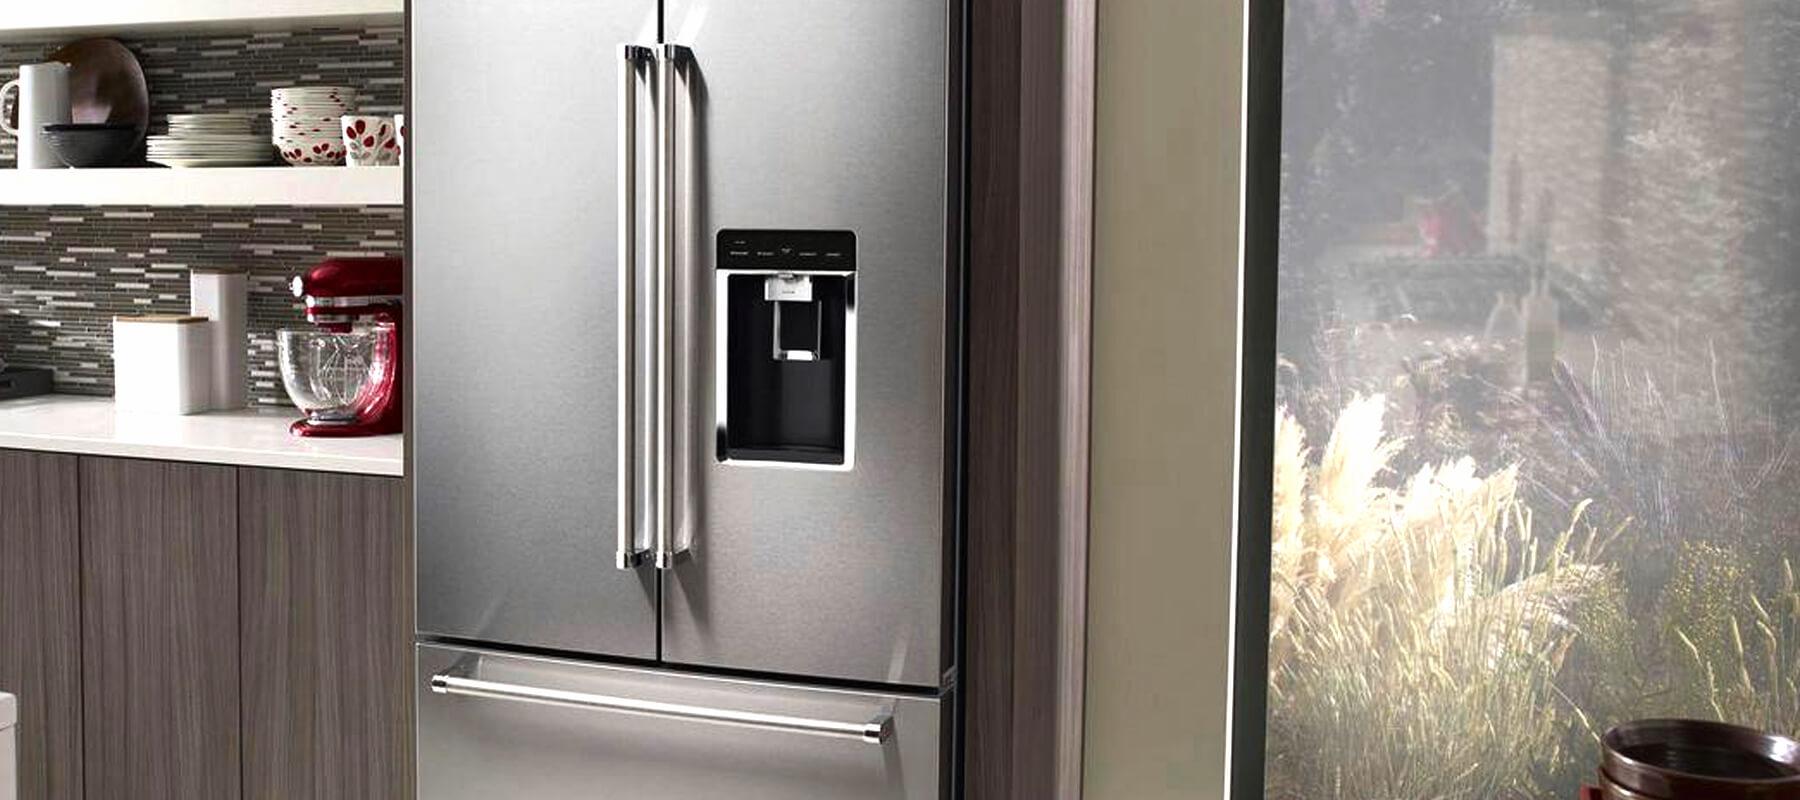 Kitchenaid Built in Refrigerator Service | Built in Refrigerator Repair Service